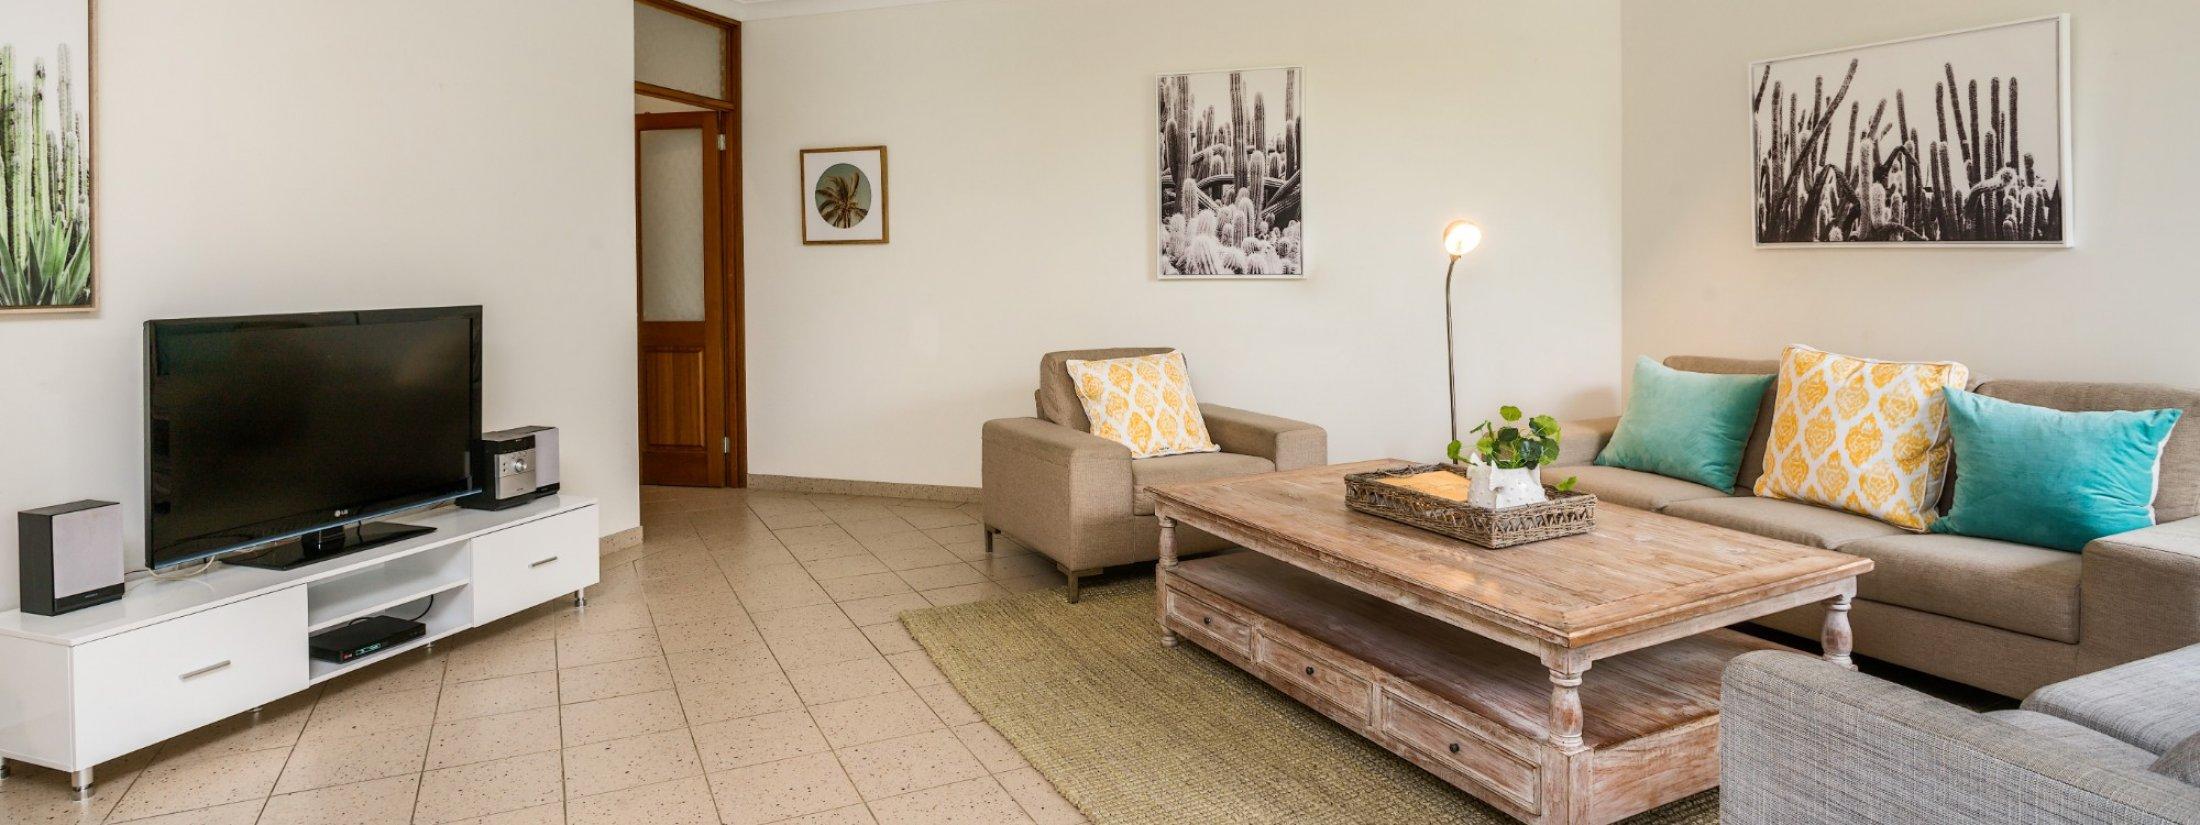 Byron Breeze 5 - Byron Bay - Clarkes Beach - lounge room